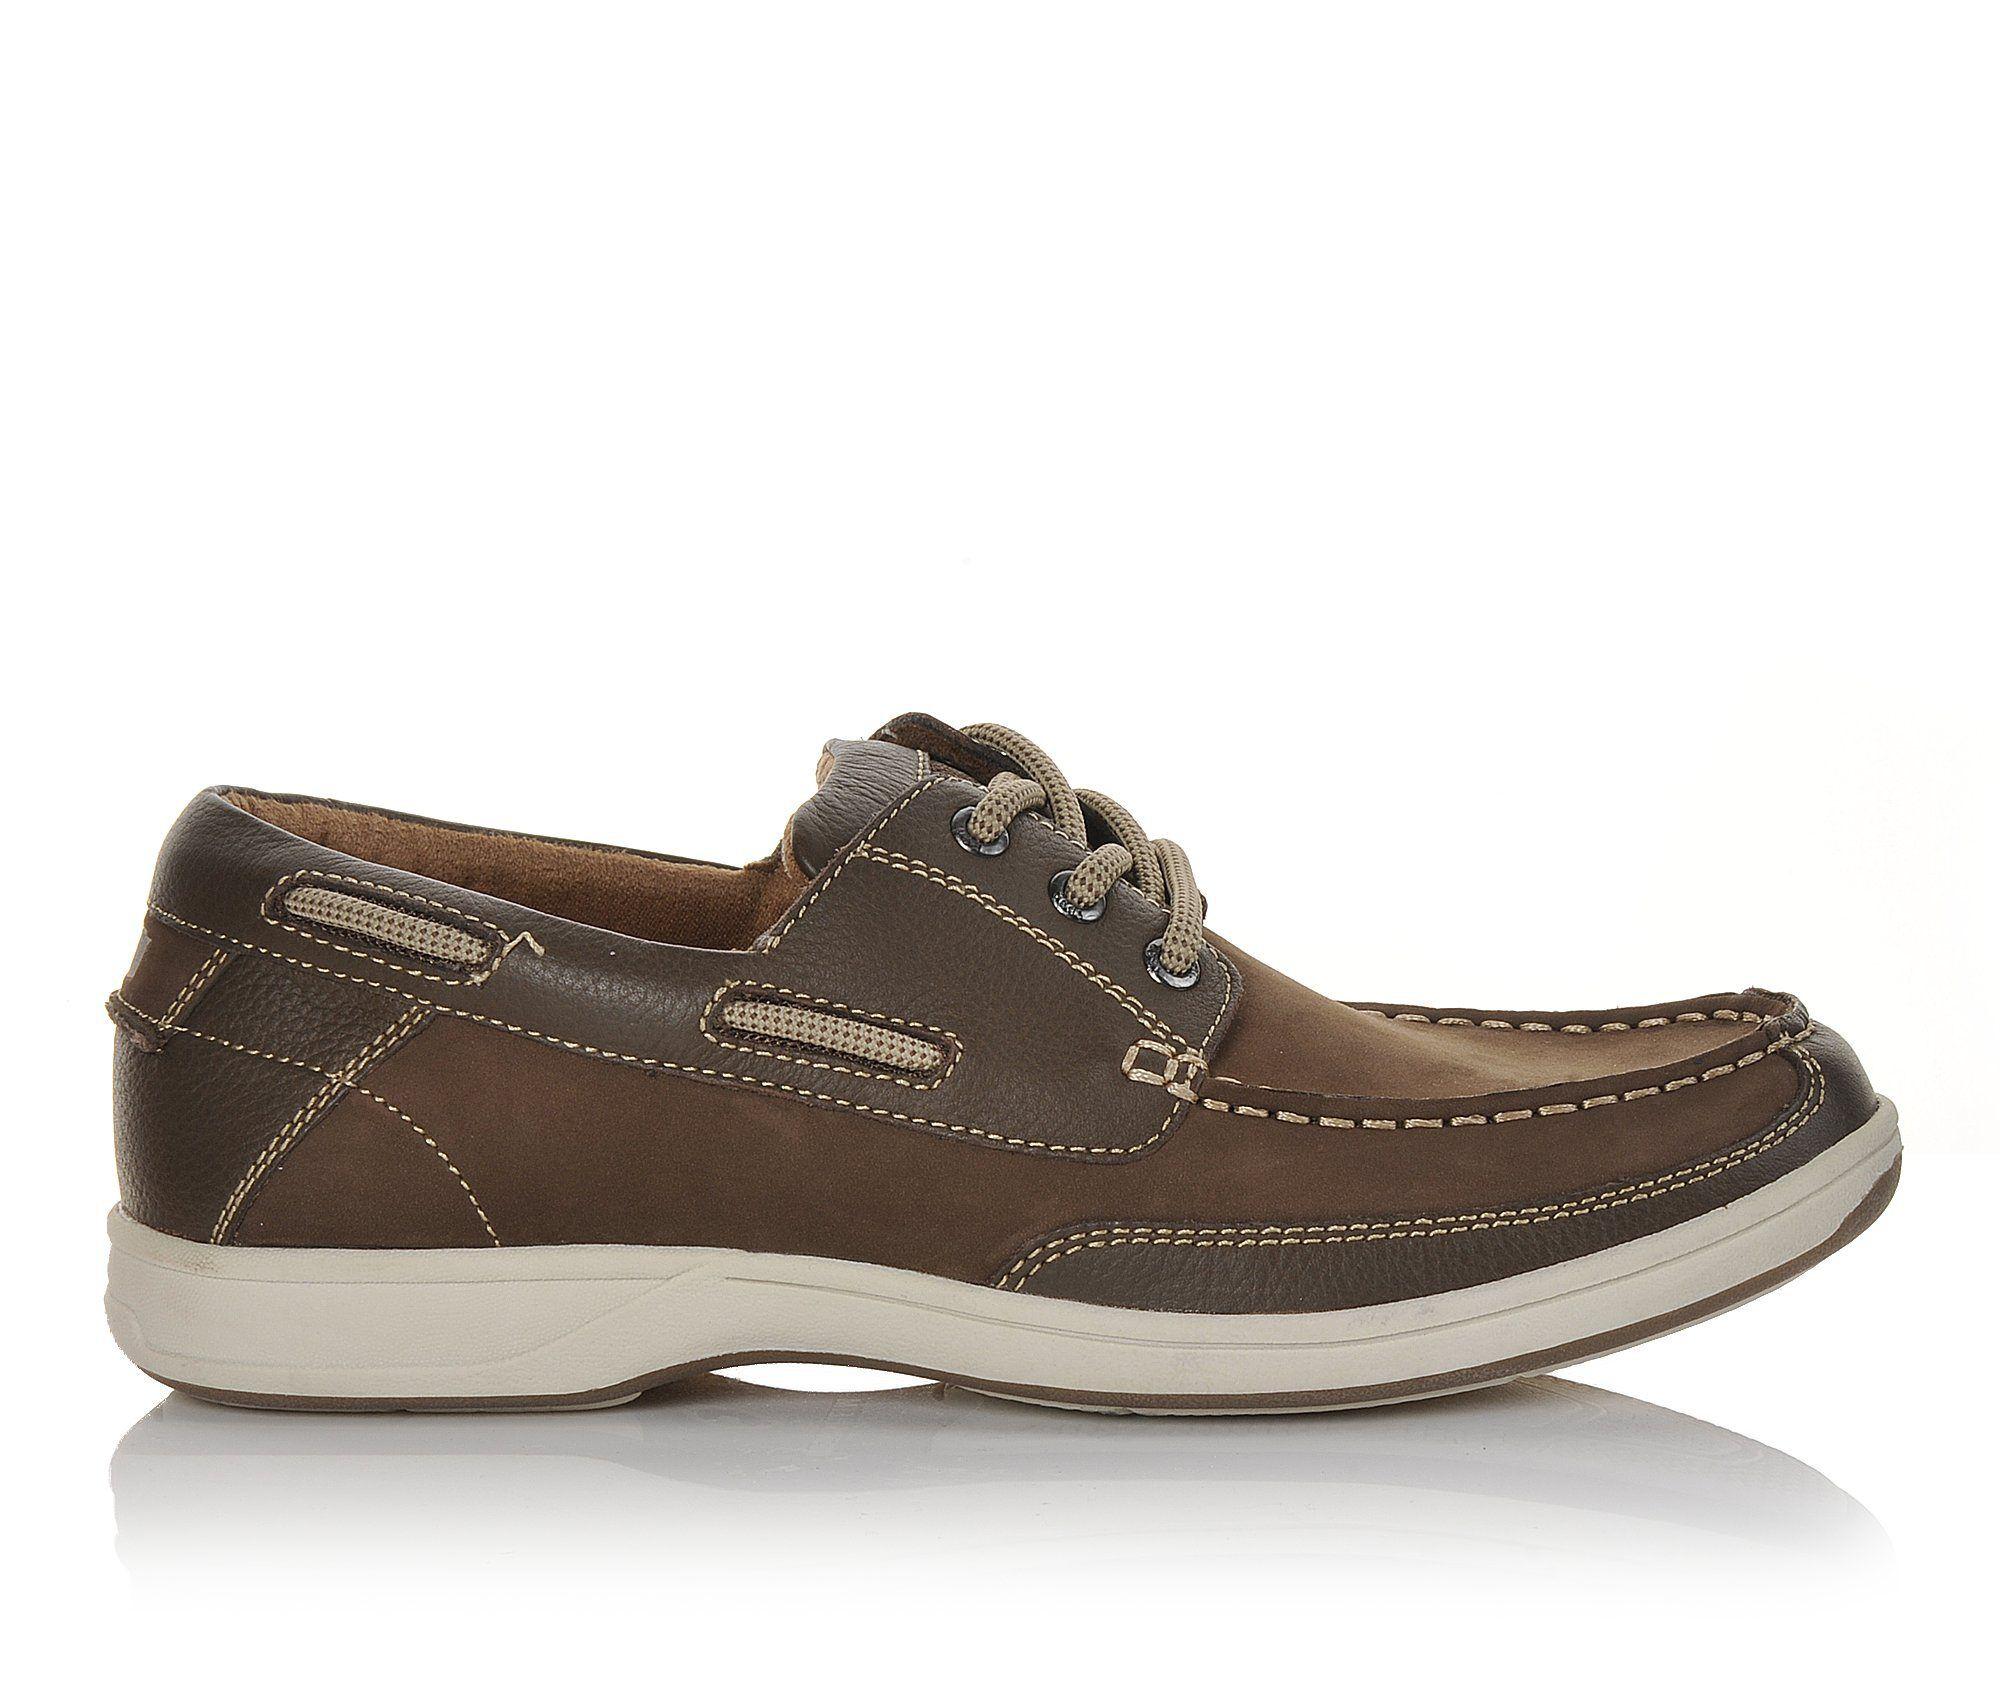 get classic Men's Florsheim Lakeside Oxford Boat Shoes Brown Nubuck